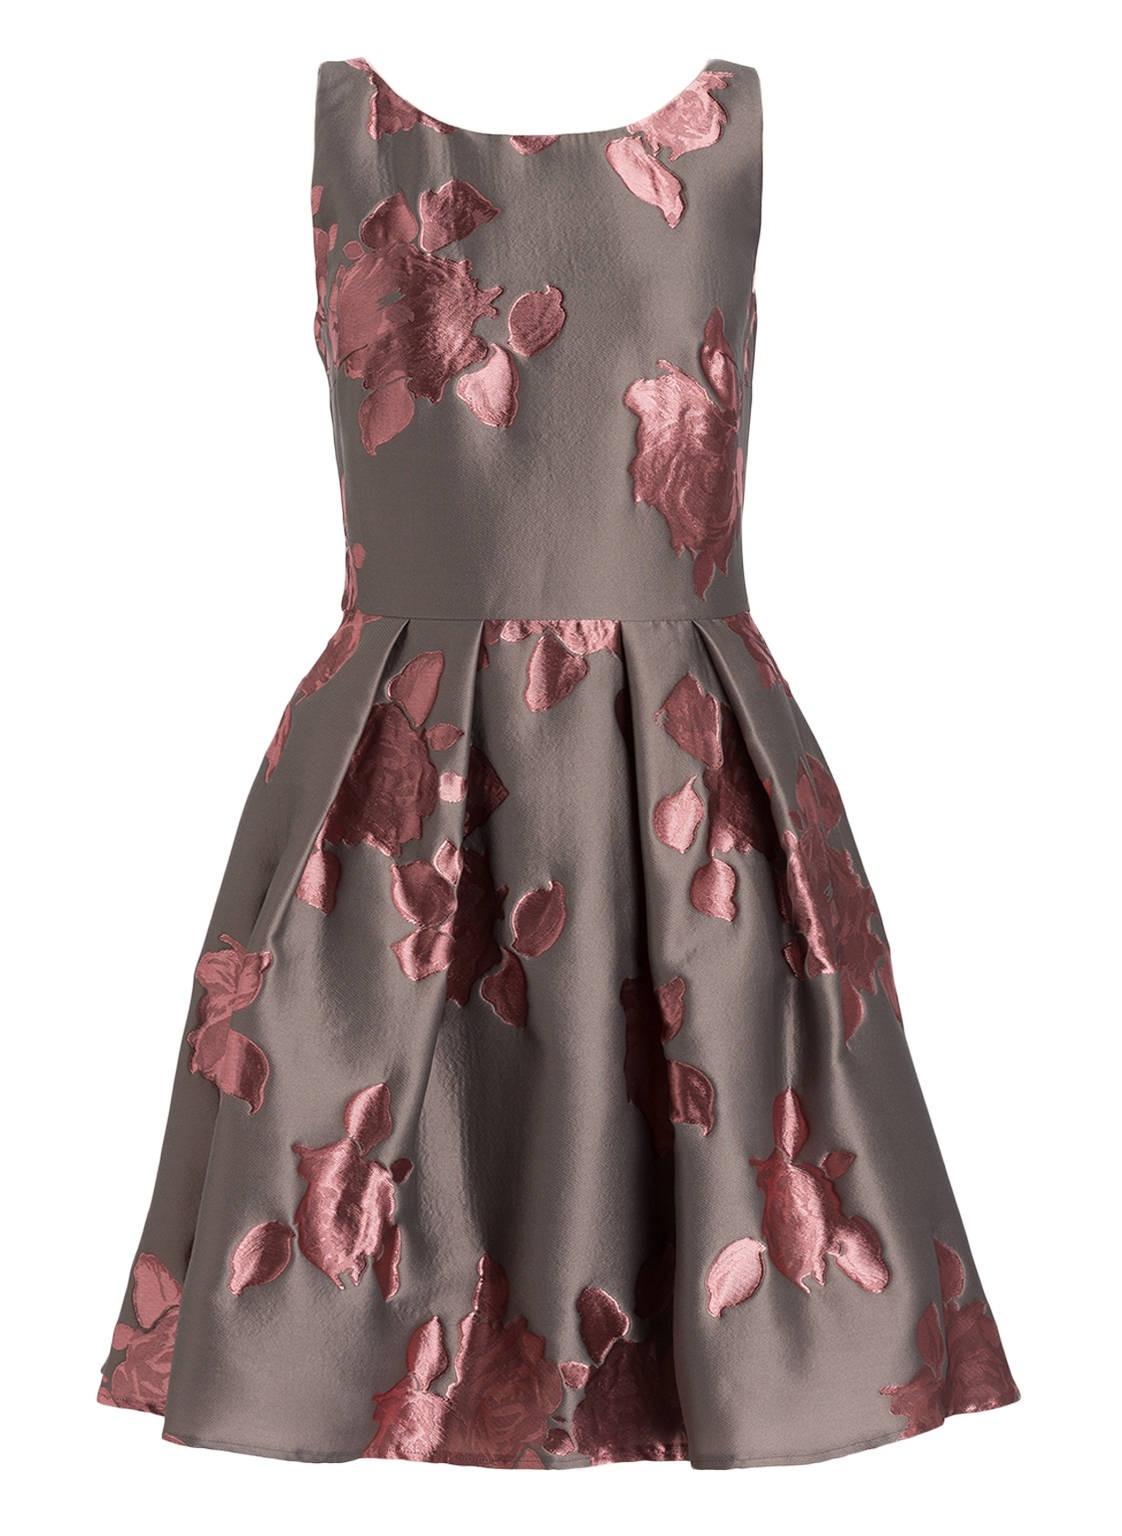 15 Coolste Kleid Grau Rosa Vertrieb10 Wunderbar Kleid Grau Rosa Stylish